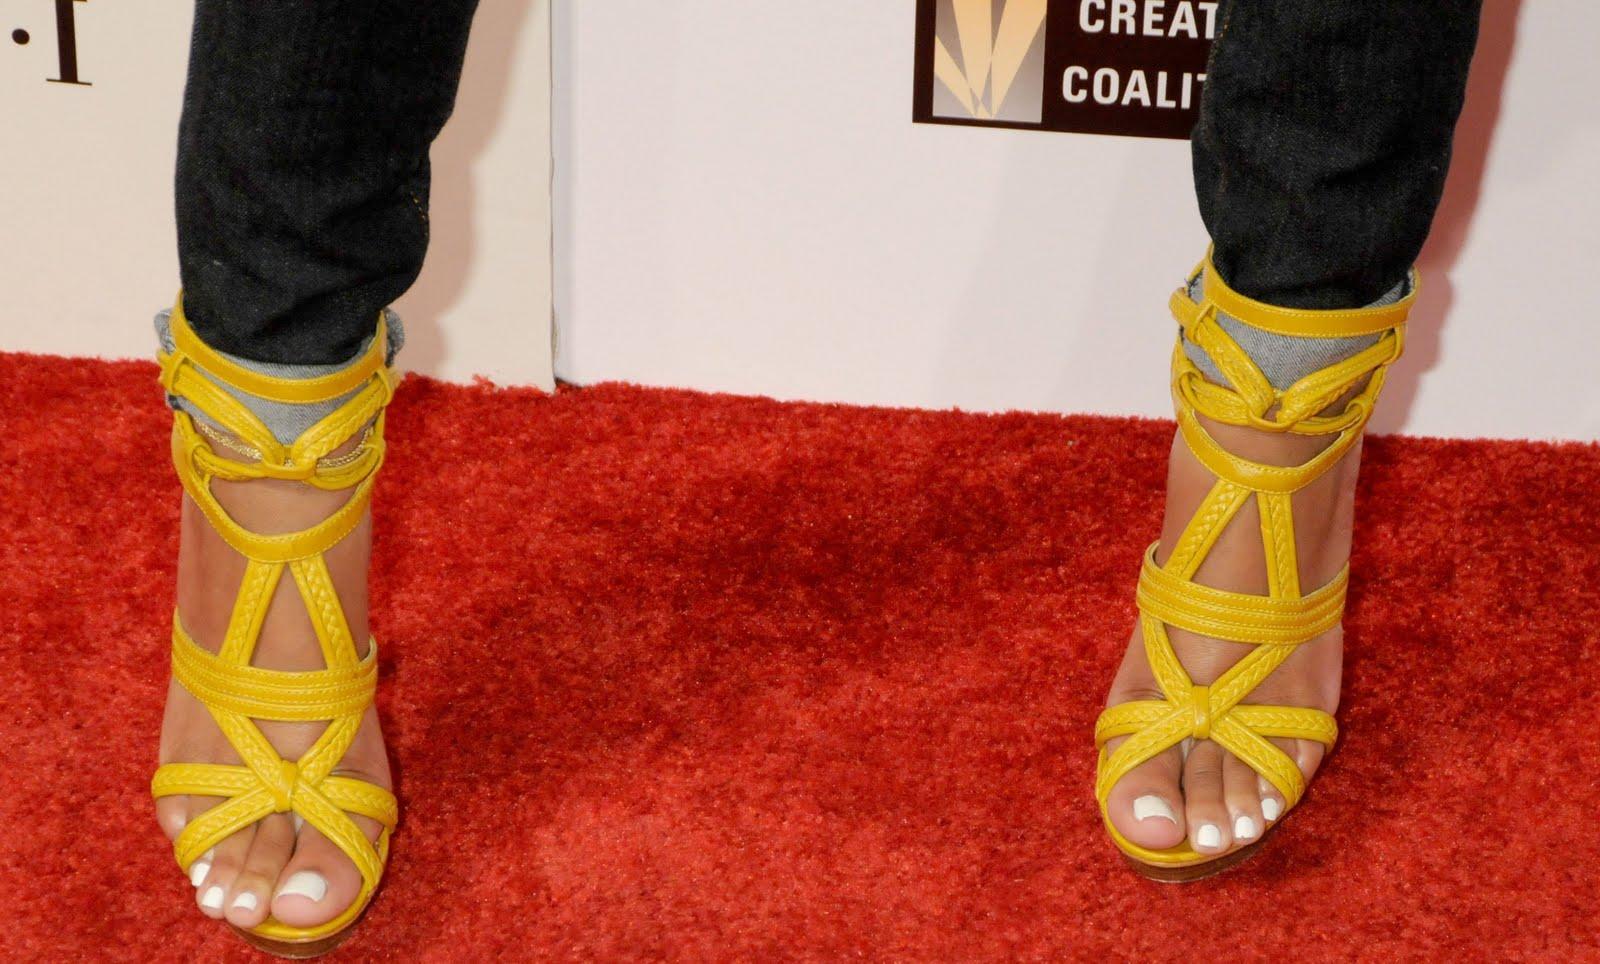 Meagan good shoe size celebrity feet size